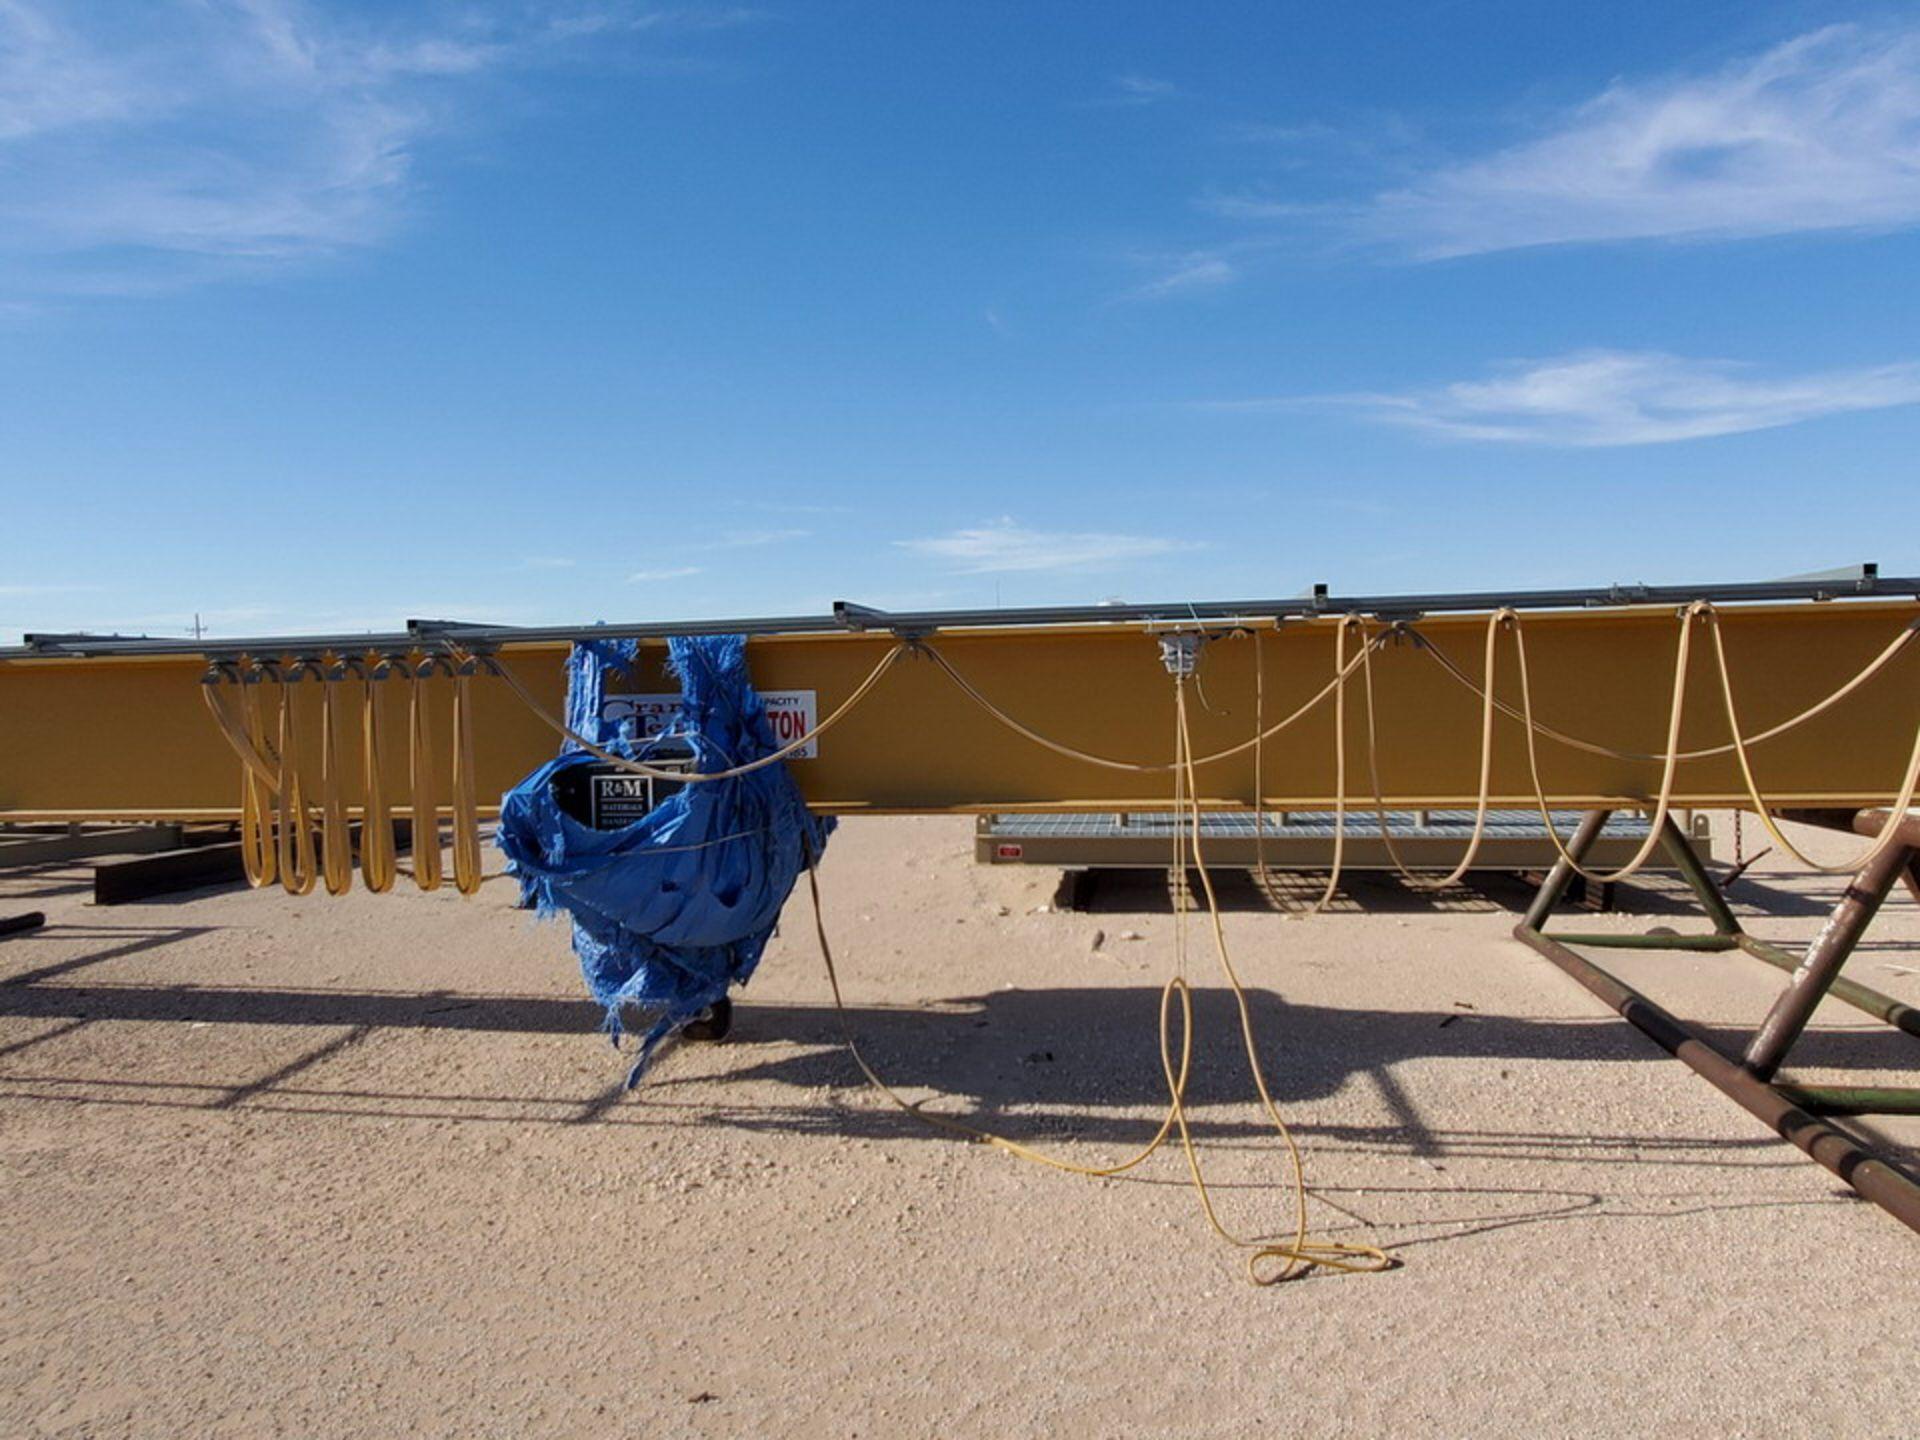 R & M 10 Ton Top Riding Bridge Crane Approx. 66' x 10'L - Image 31 of 39